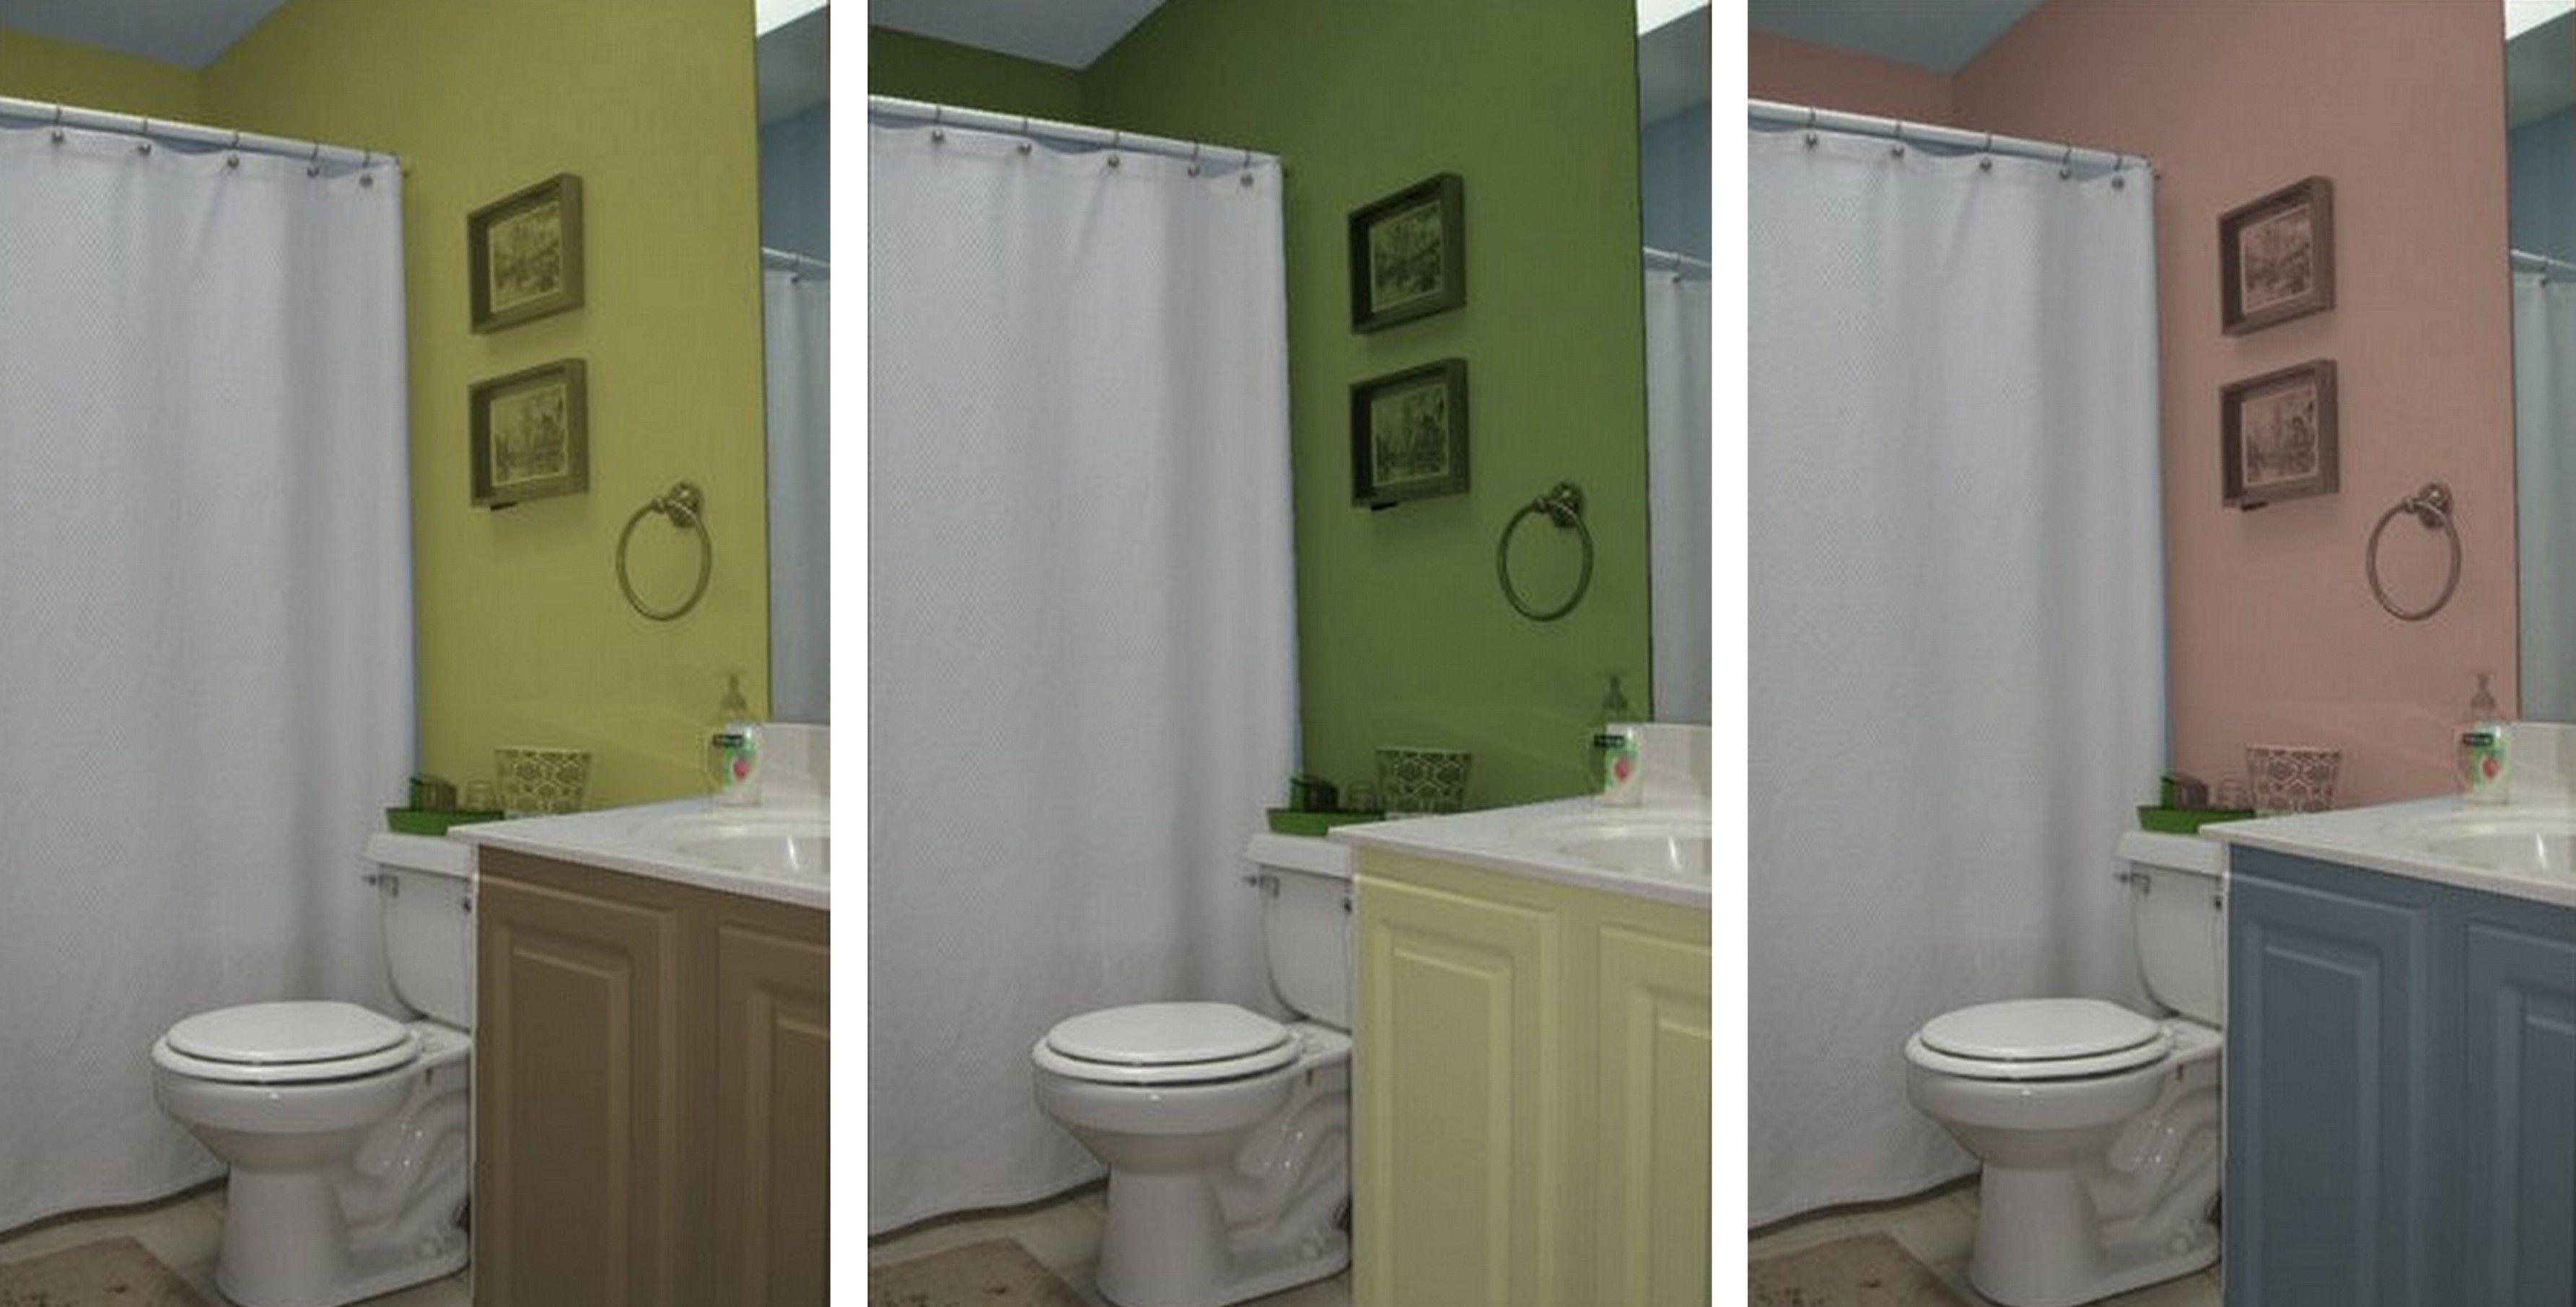 small bathroom ideas pinterest with images bathroom on interior paint scheme ideas id=76268